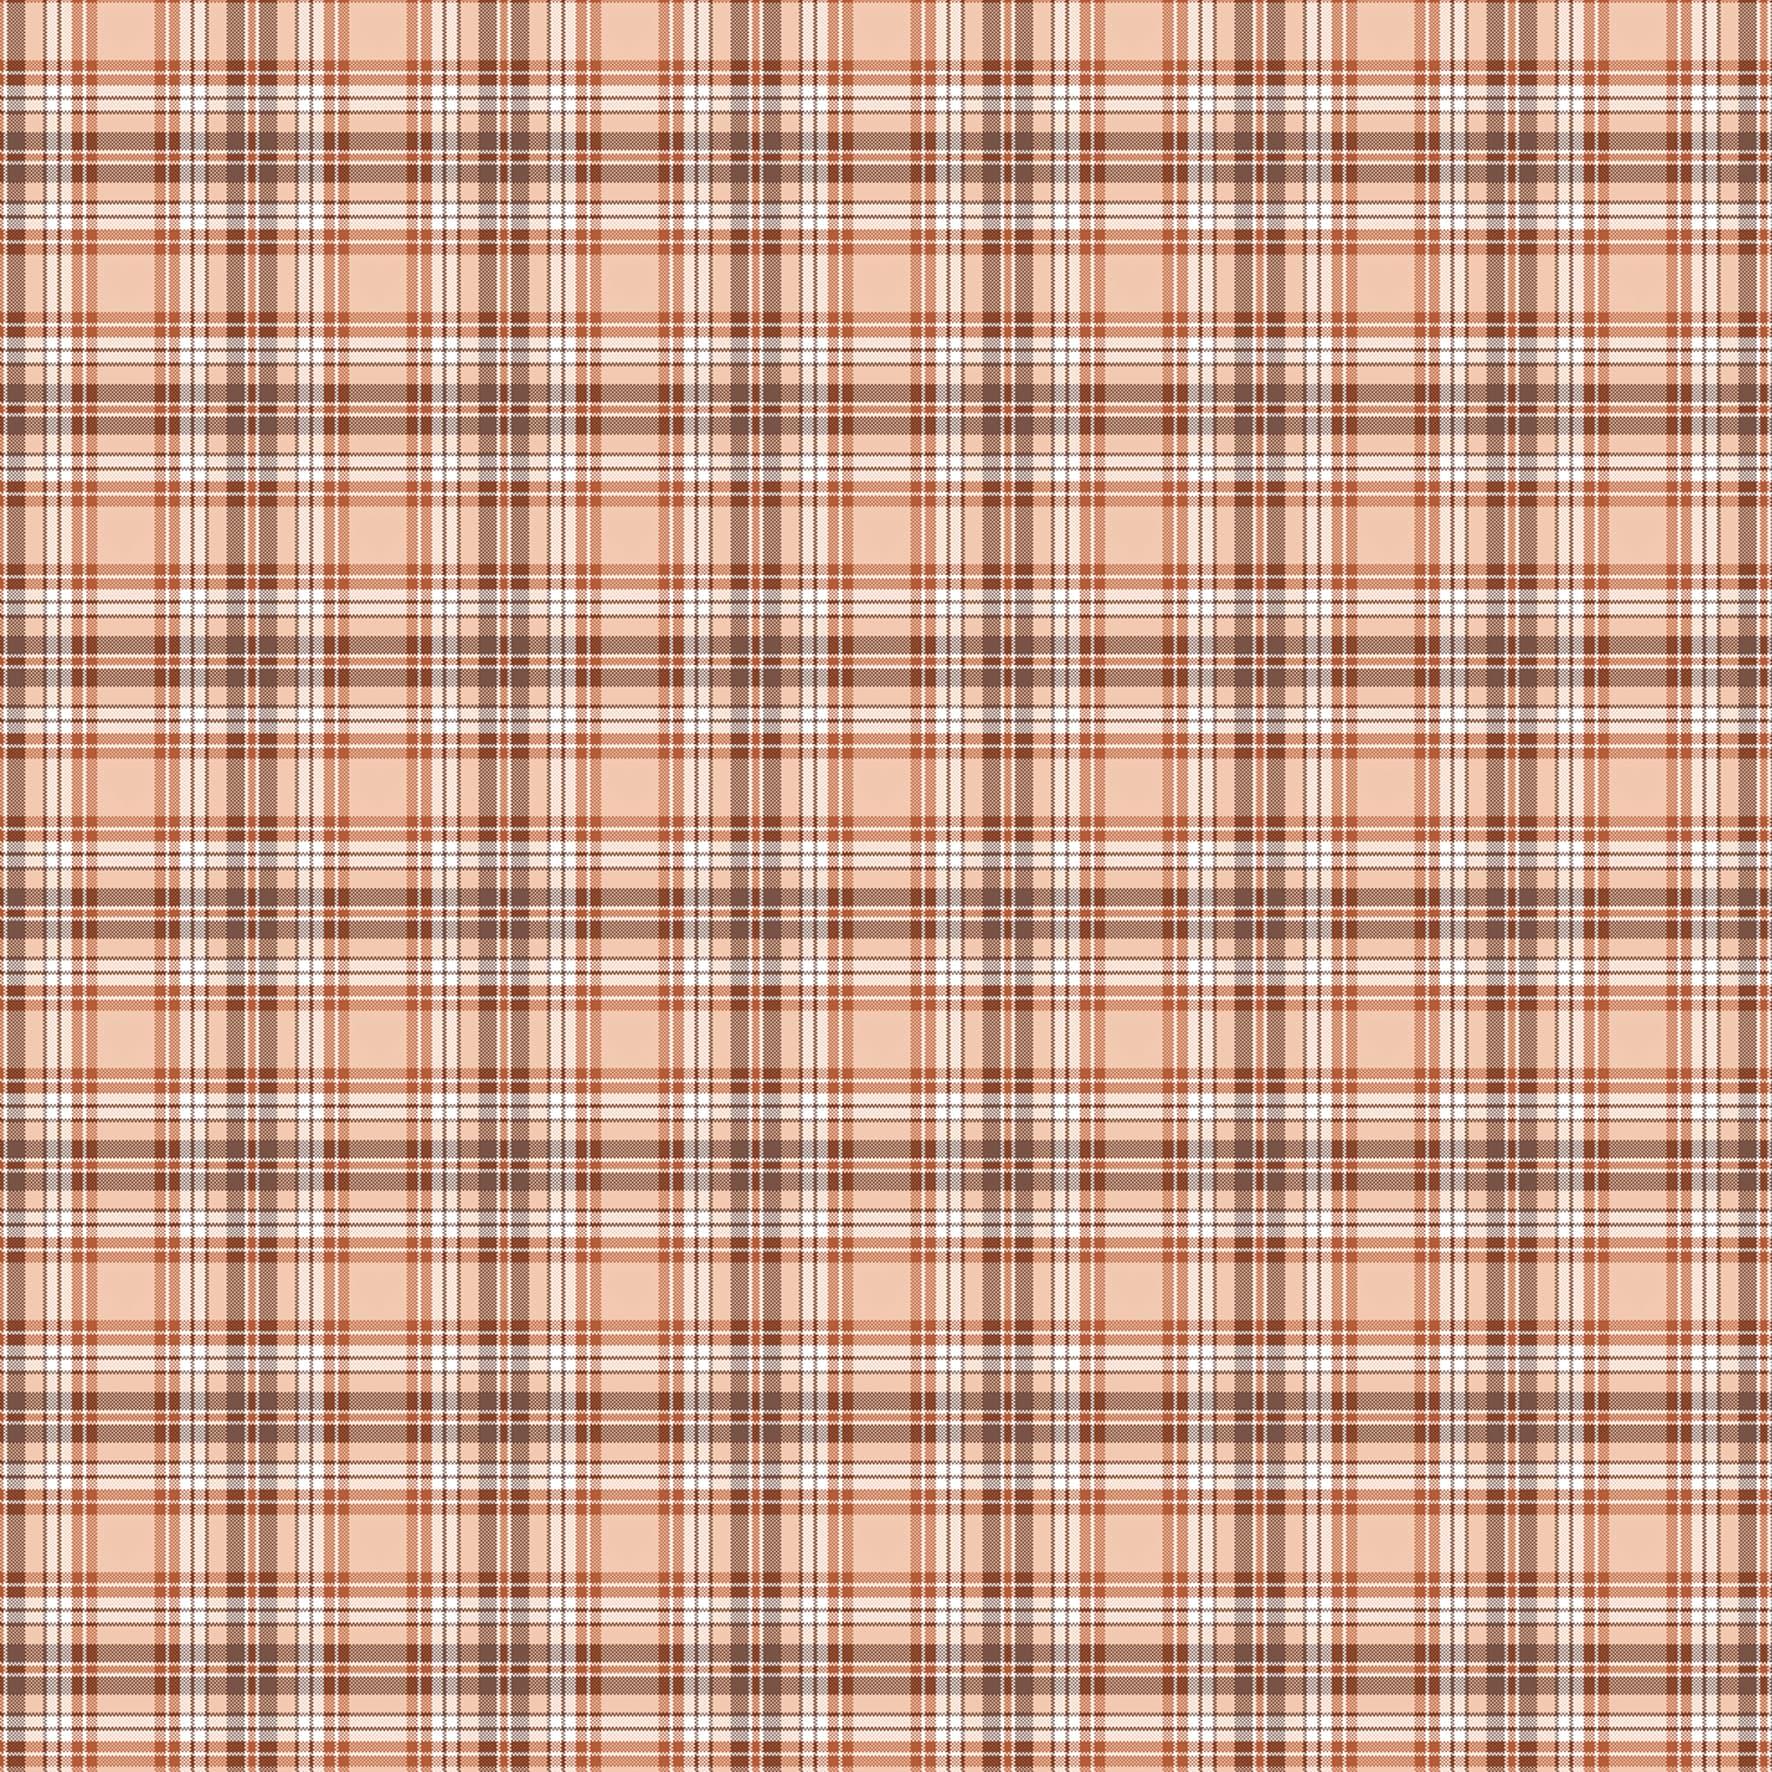 Вафельное полотенце Денди р. 100х150Вафельные полотенца<br><br><br>Тип: Вафельное полотенце<br>Размер: 100х150<br>Материал: Вафельное полотно